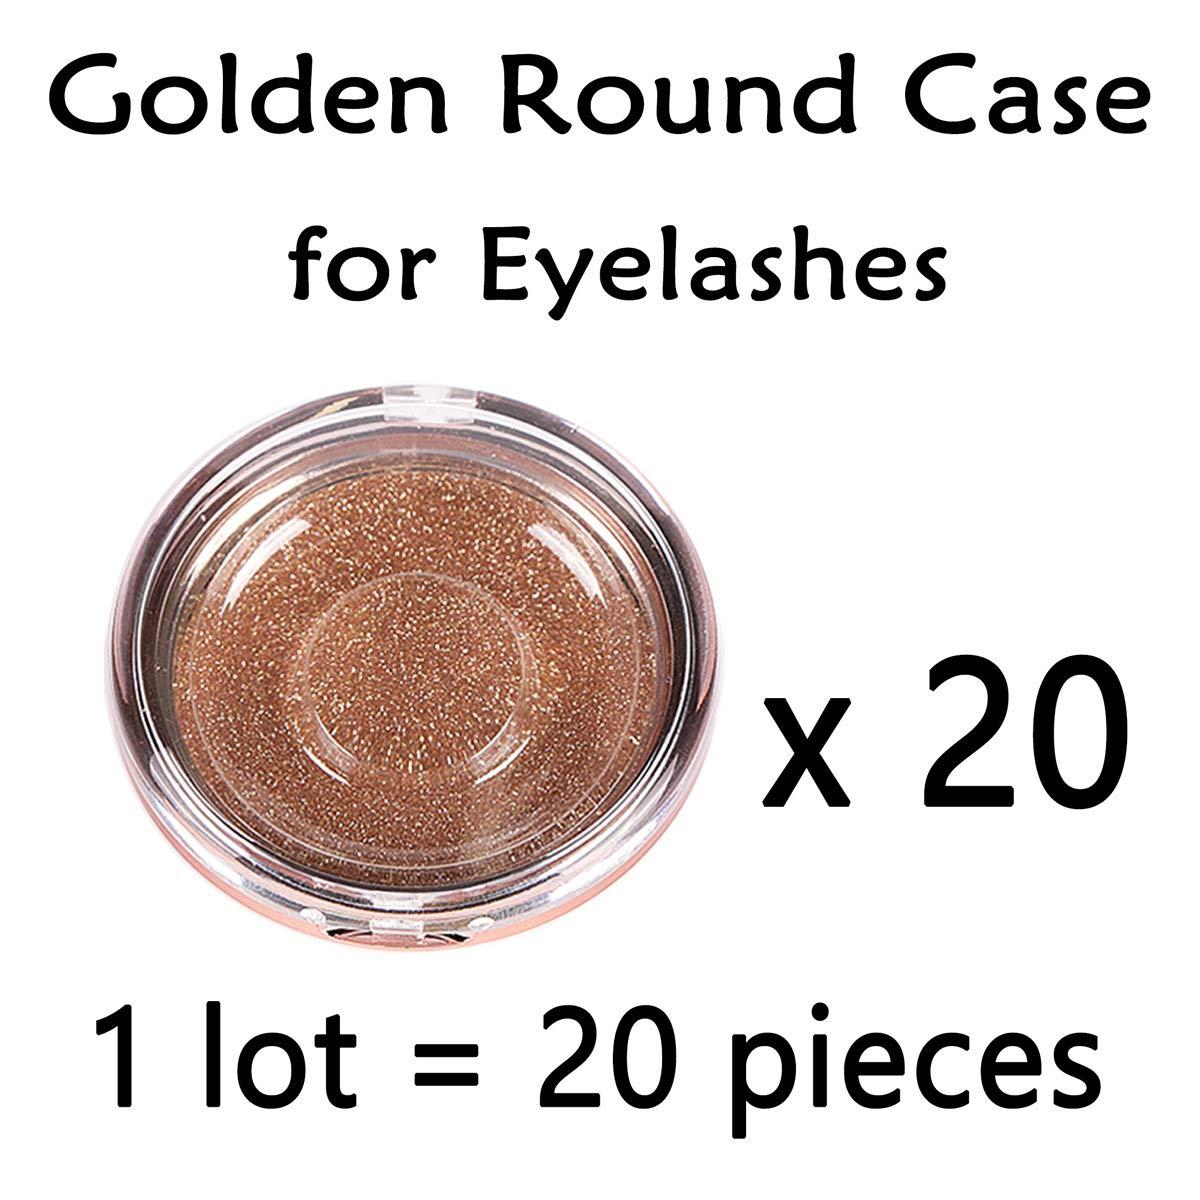 3b70e1af92 Amazon.com : 20pcs Round 1-Pair Eyelash Case (Golden) for Strip False Eyelashes  Cute Cases for Girl Lash Makeup : Beauty